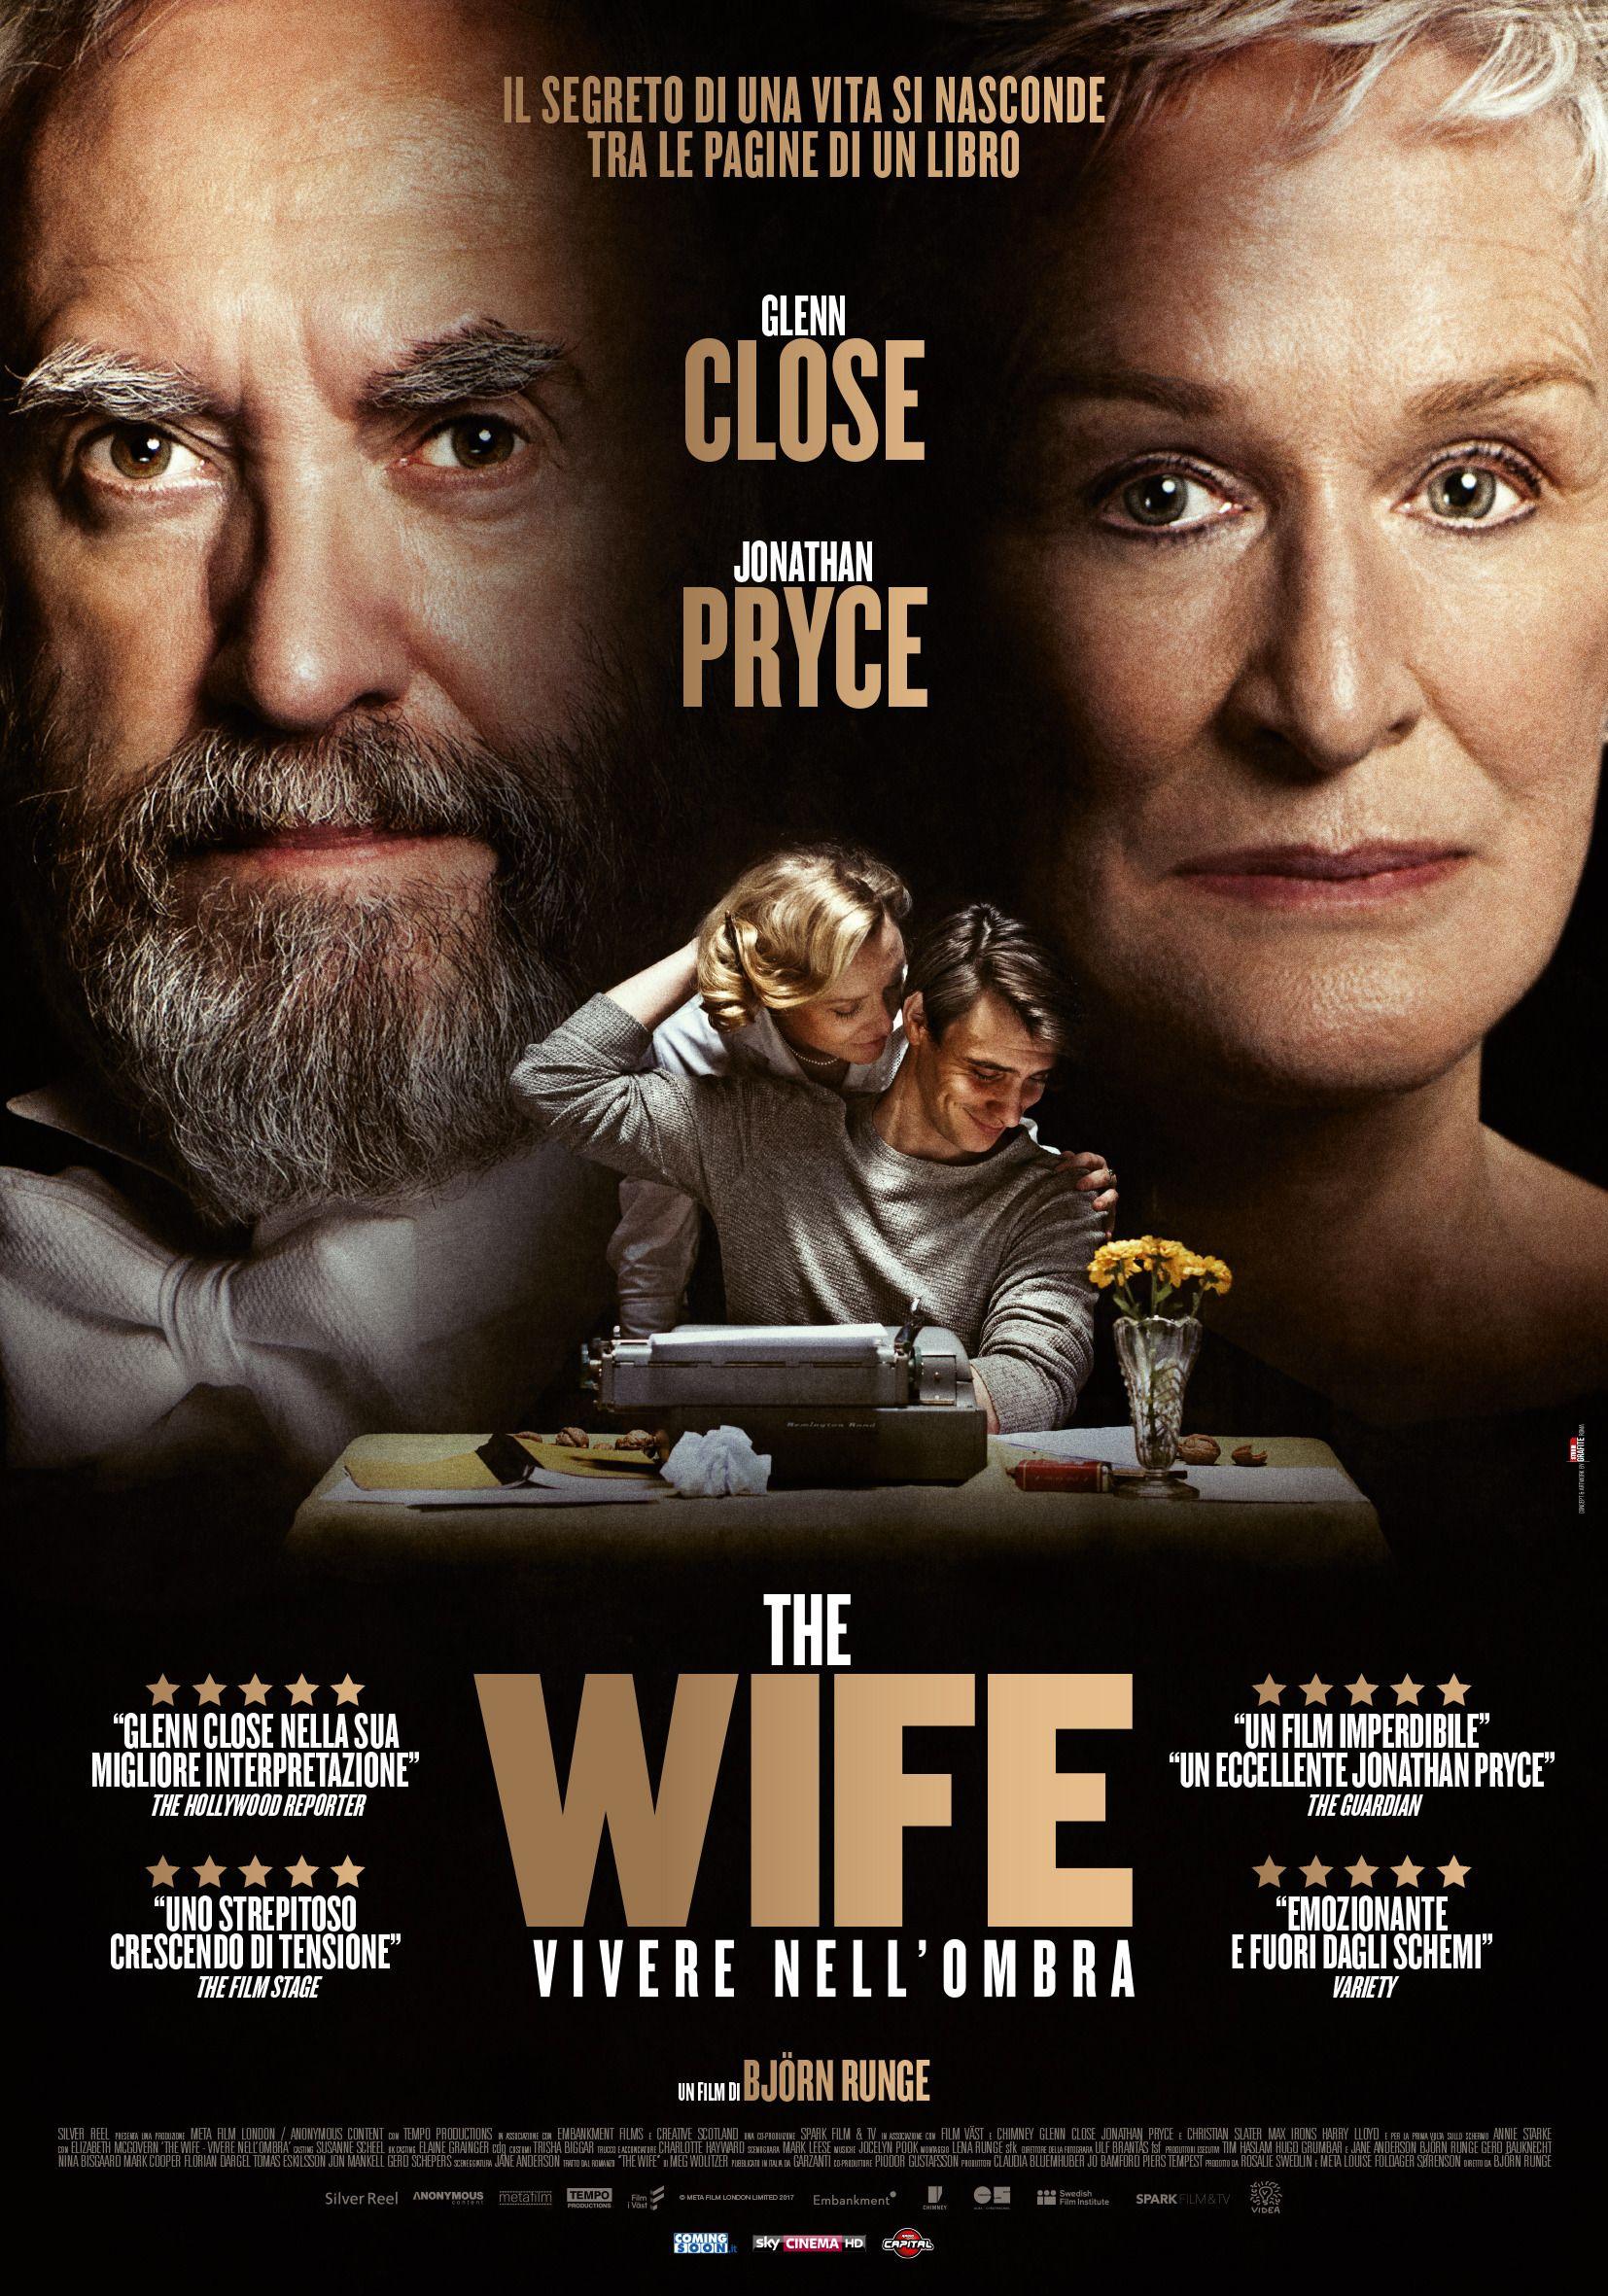 Poster Filma Zhena Wife Movies Full Movies Online Free Full Movies